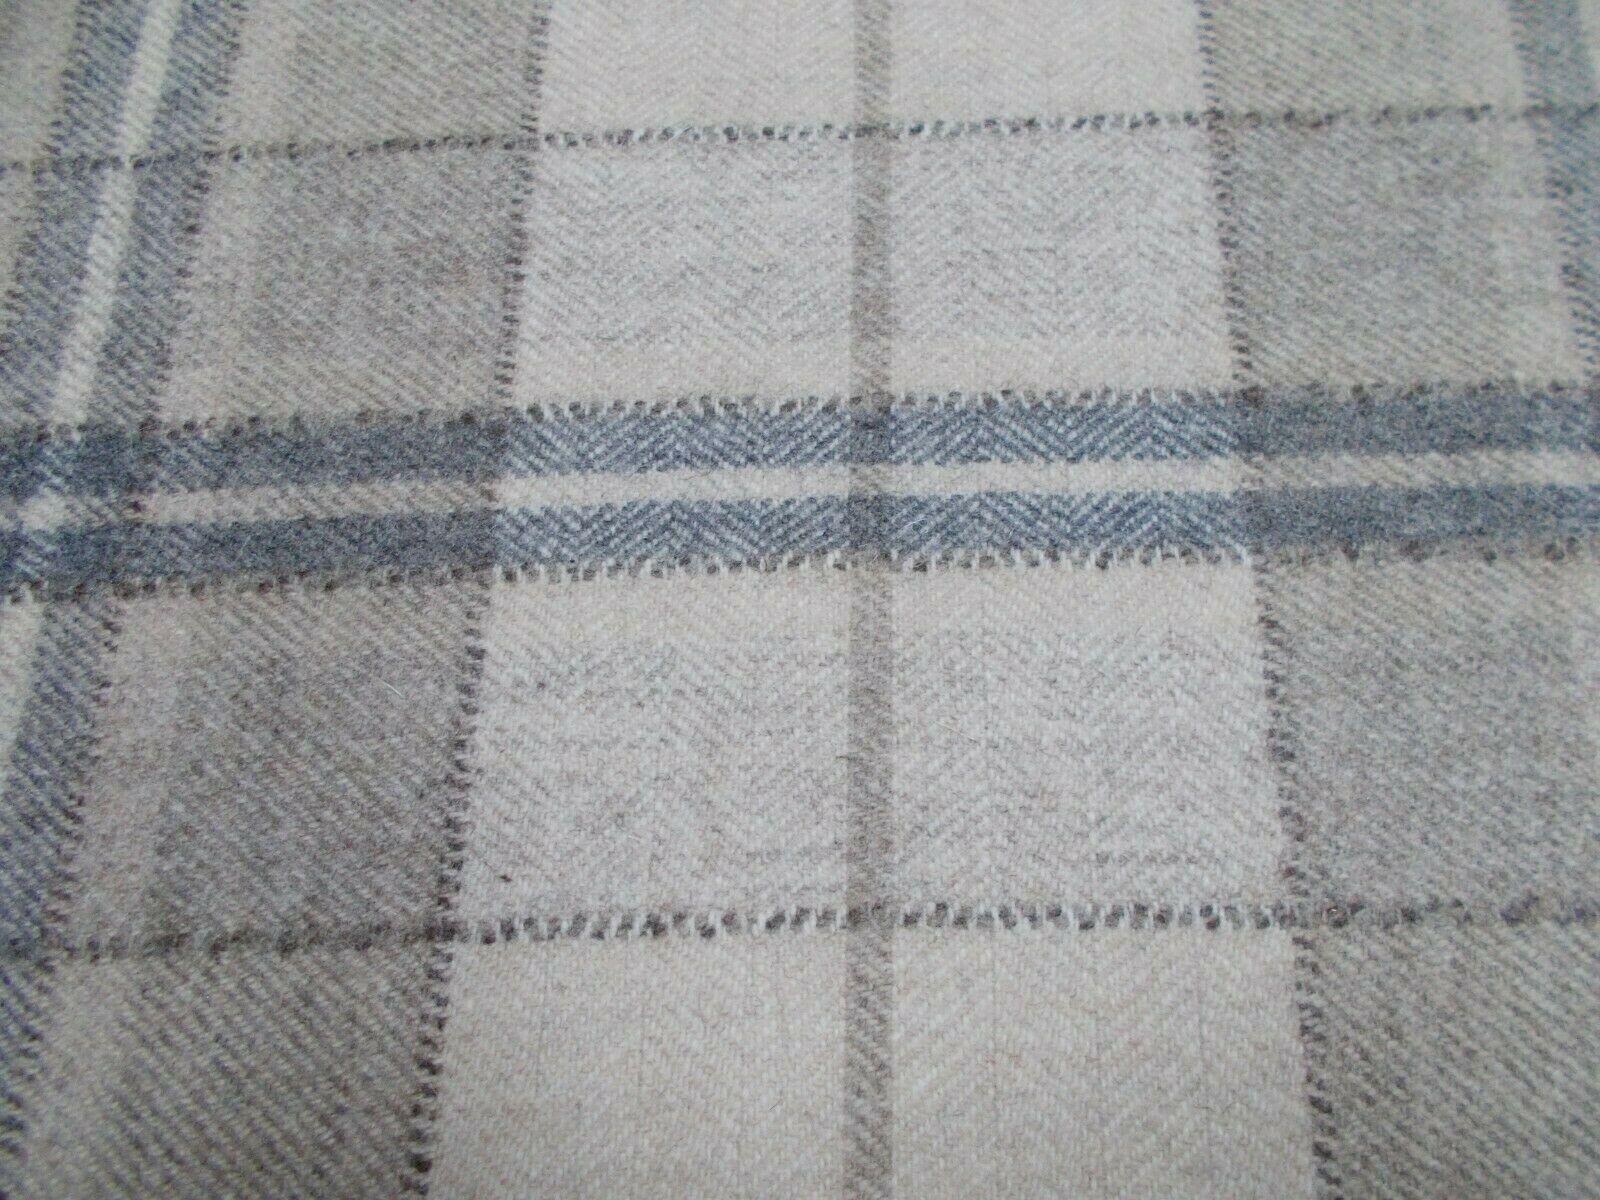 Sanderson Curtain Curtain Curtain Upholstery Fabric 'MILTON' 1.5 METRES Linen Pebble - Wool Mix 0b07ca